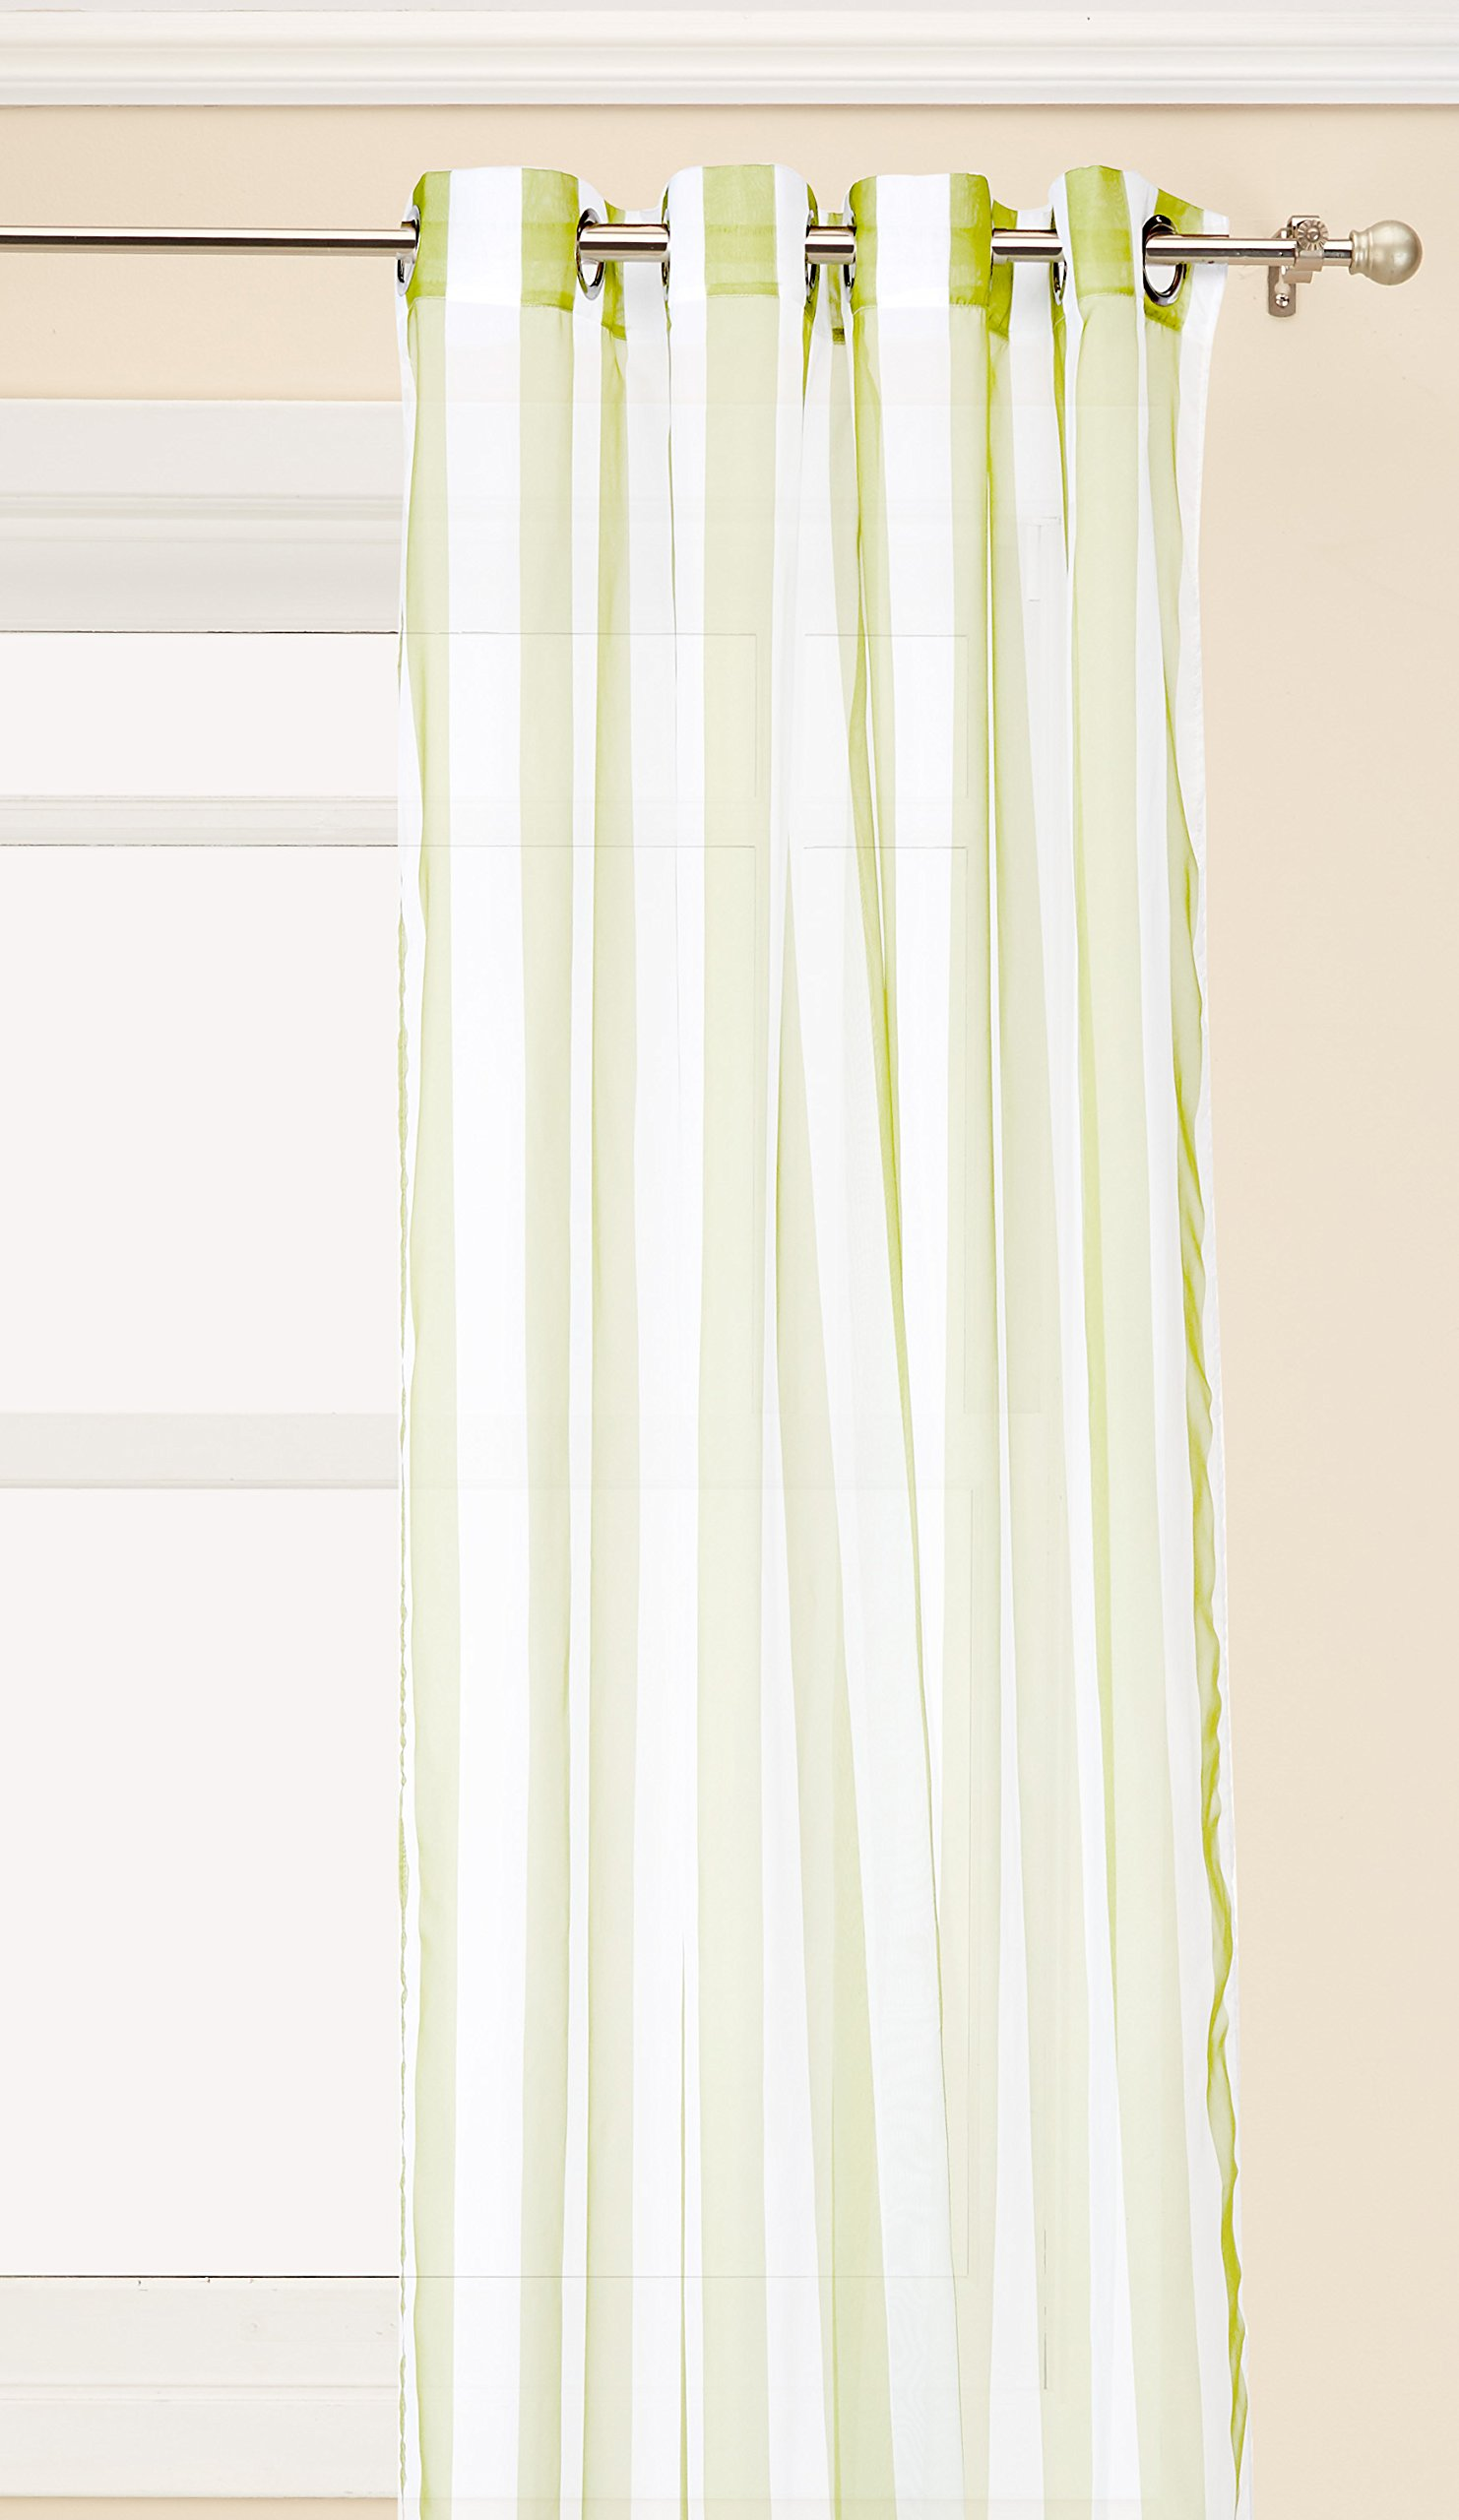 Outdoor Decor Escape stripe-84-green Green